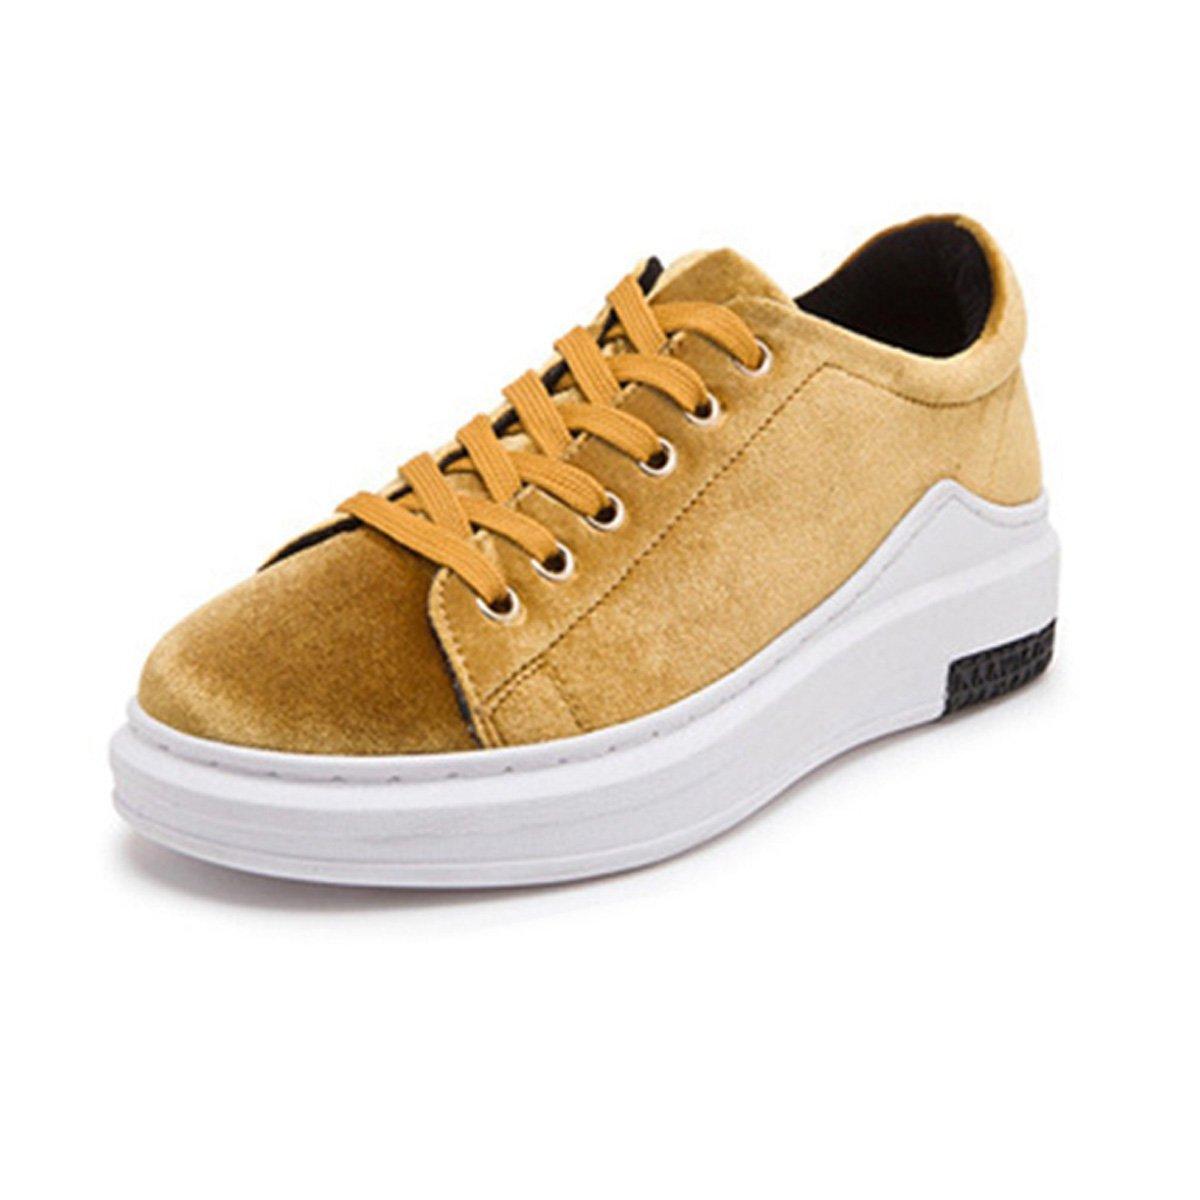 Basket mode chaussure femme chaussure loisir plate-forme sneakers compensé B000W069PS casuel sneakers sportif velours printemps Jaune 868590a - boatplans.space